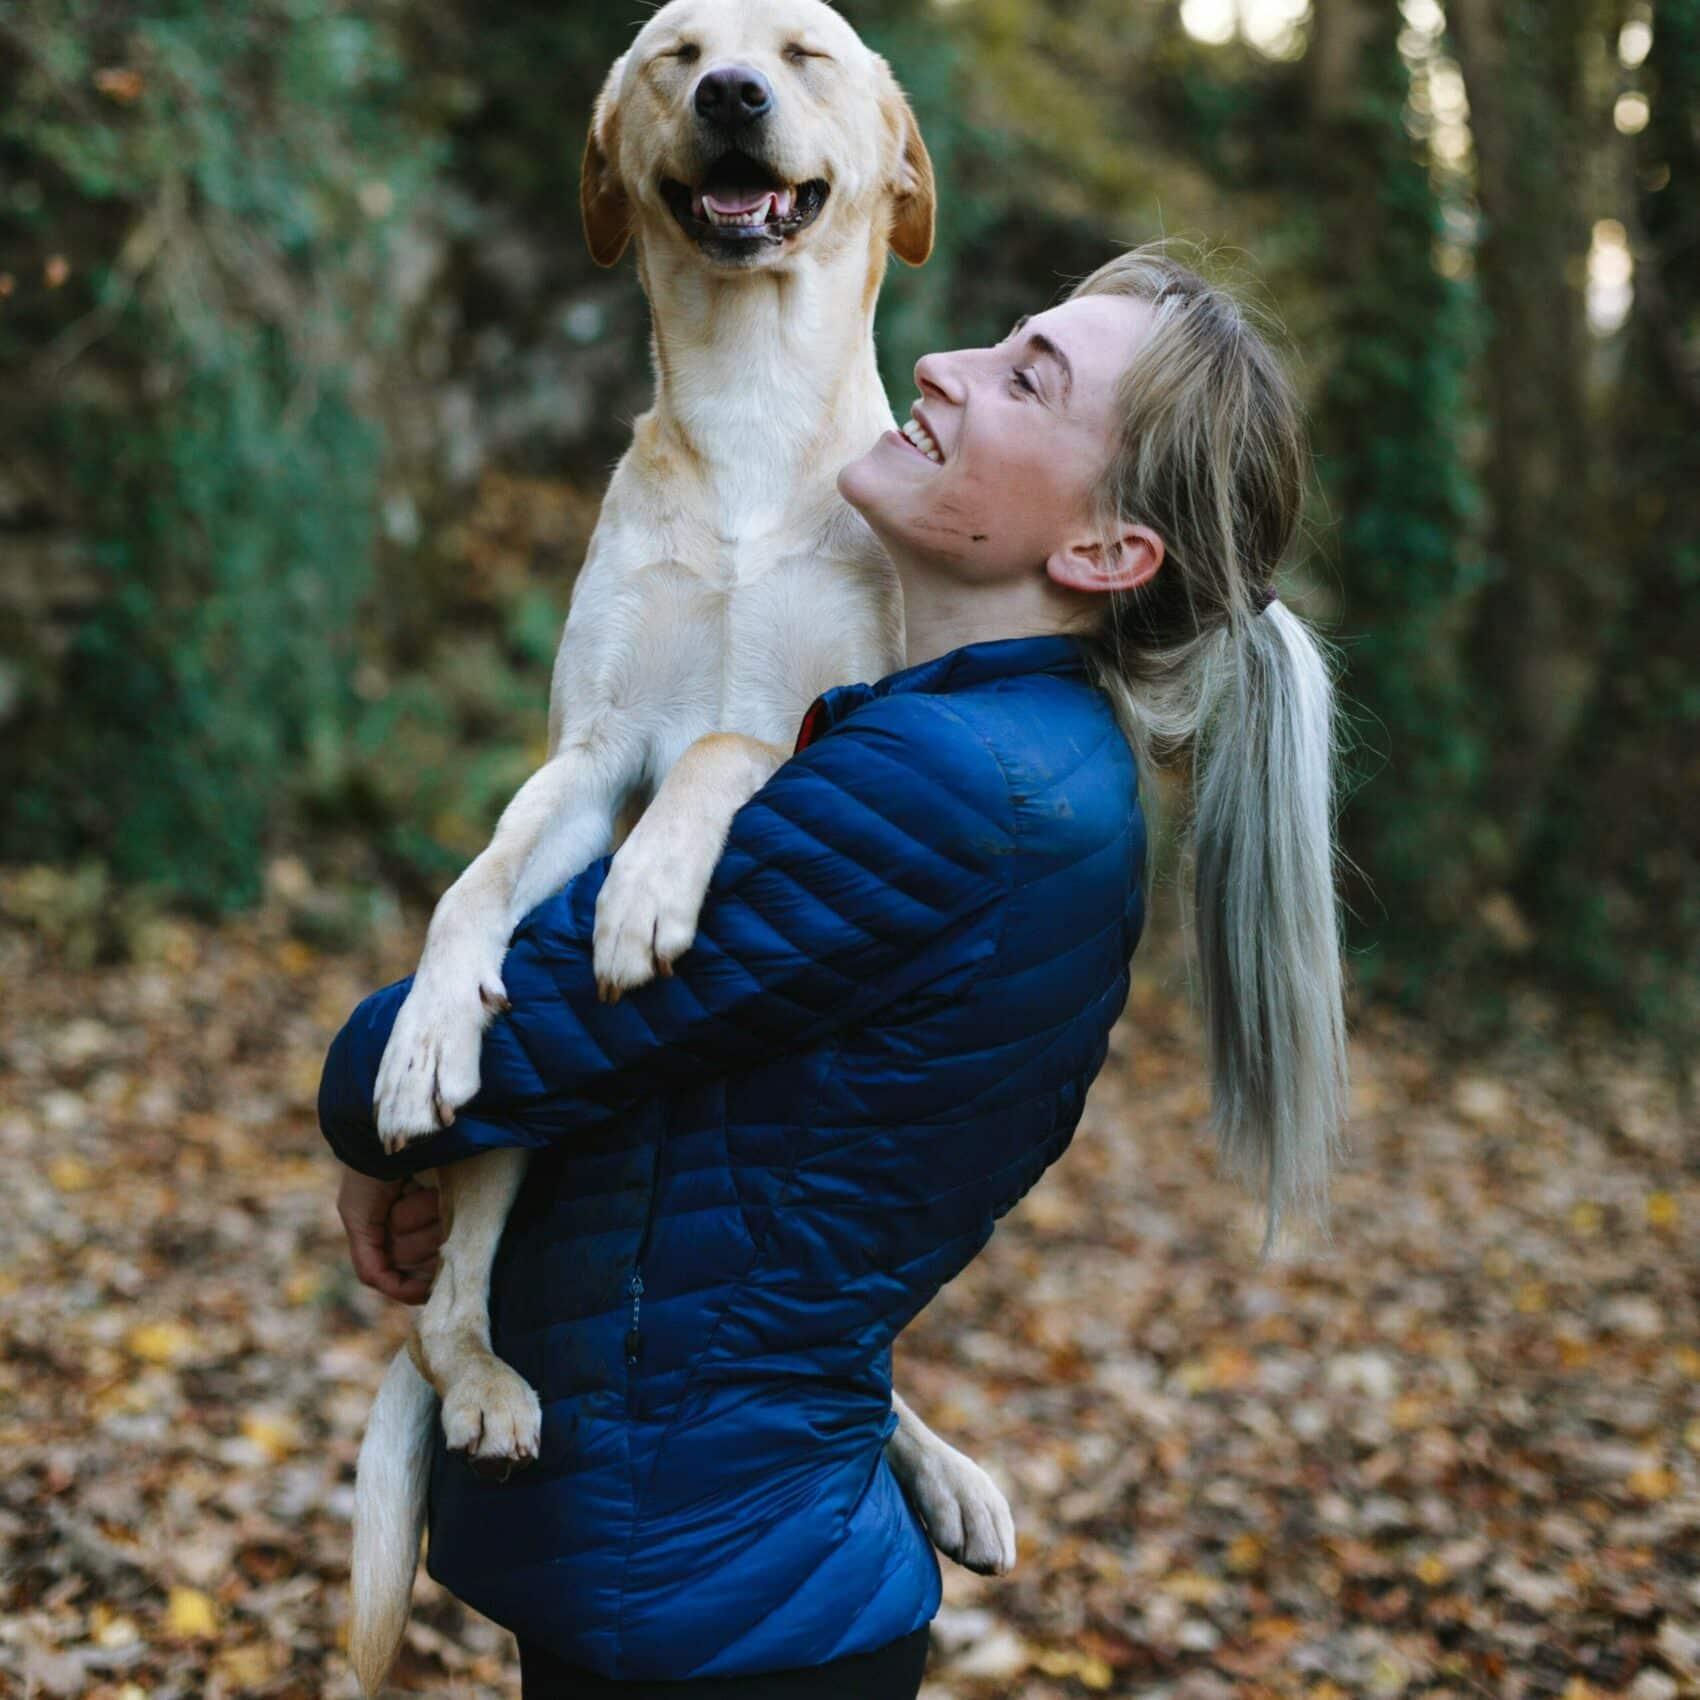 Lifting a dog